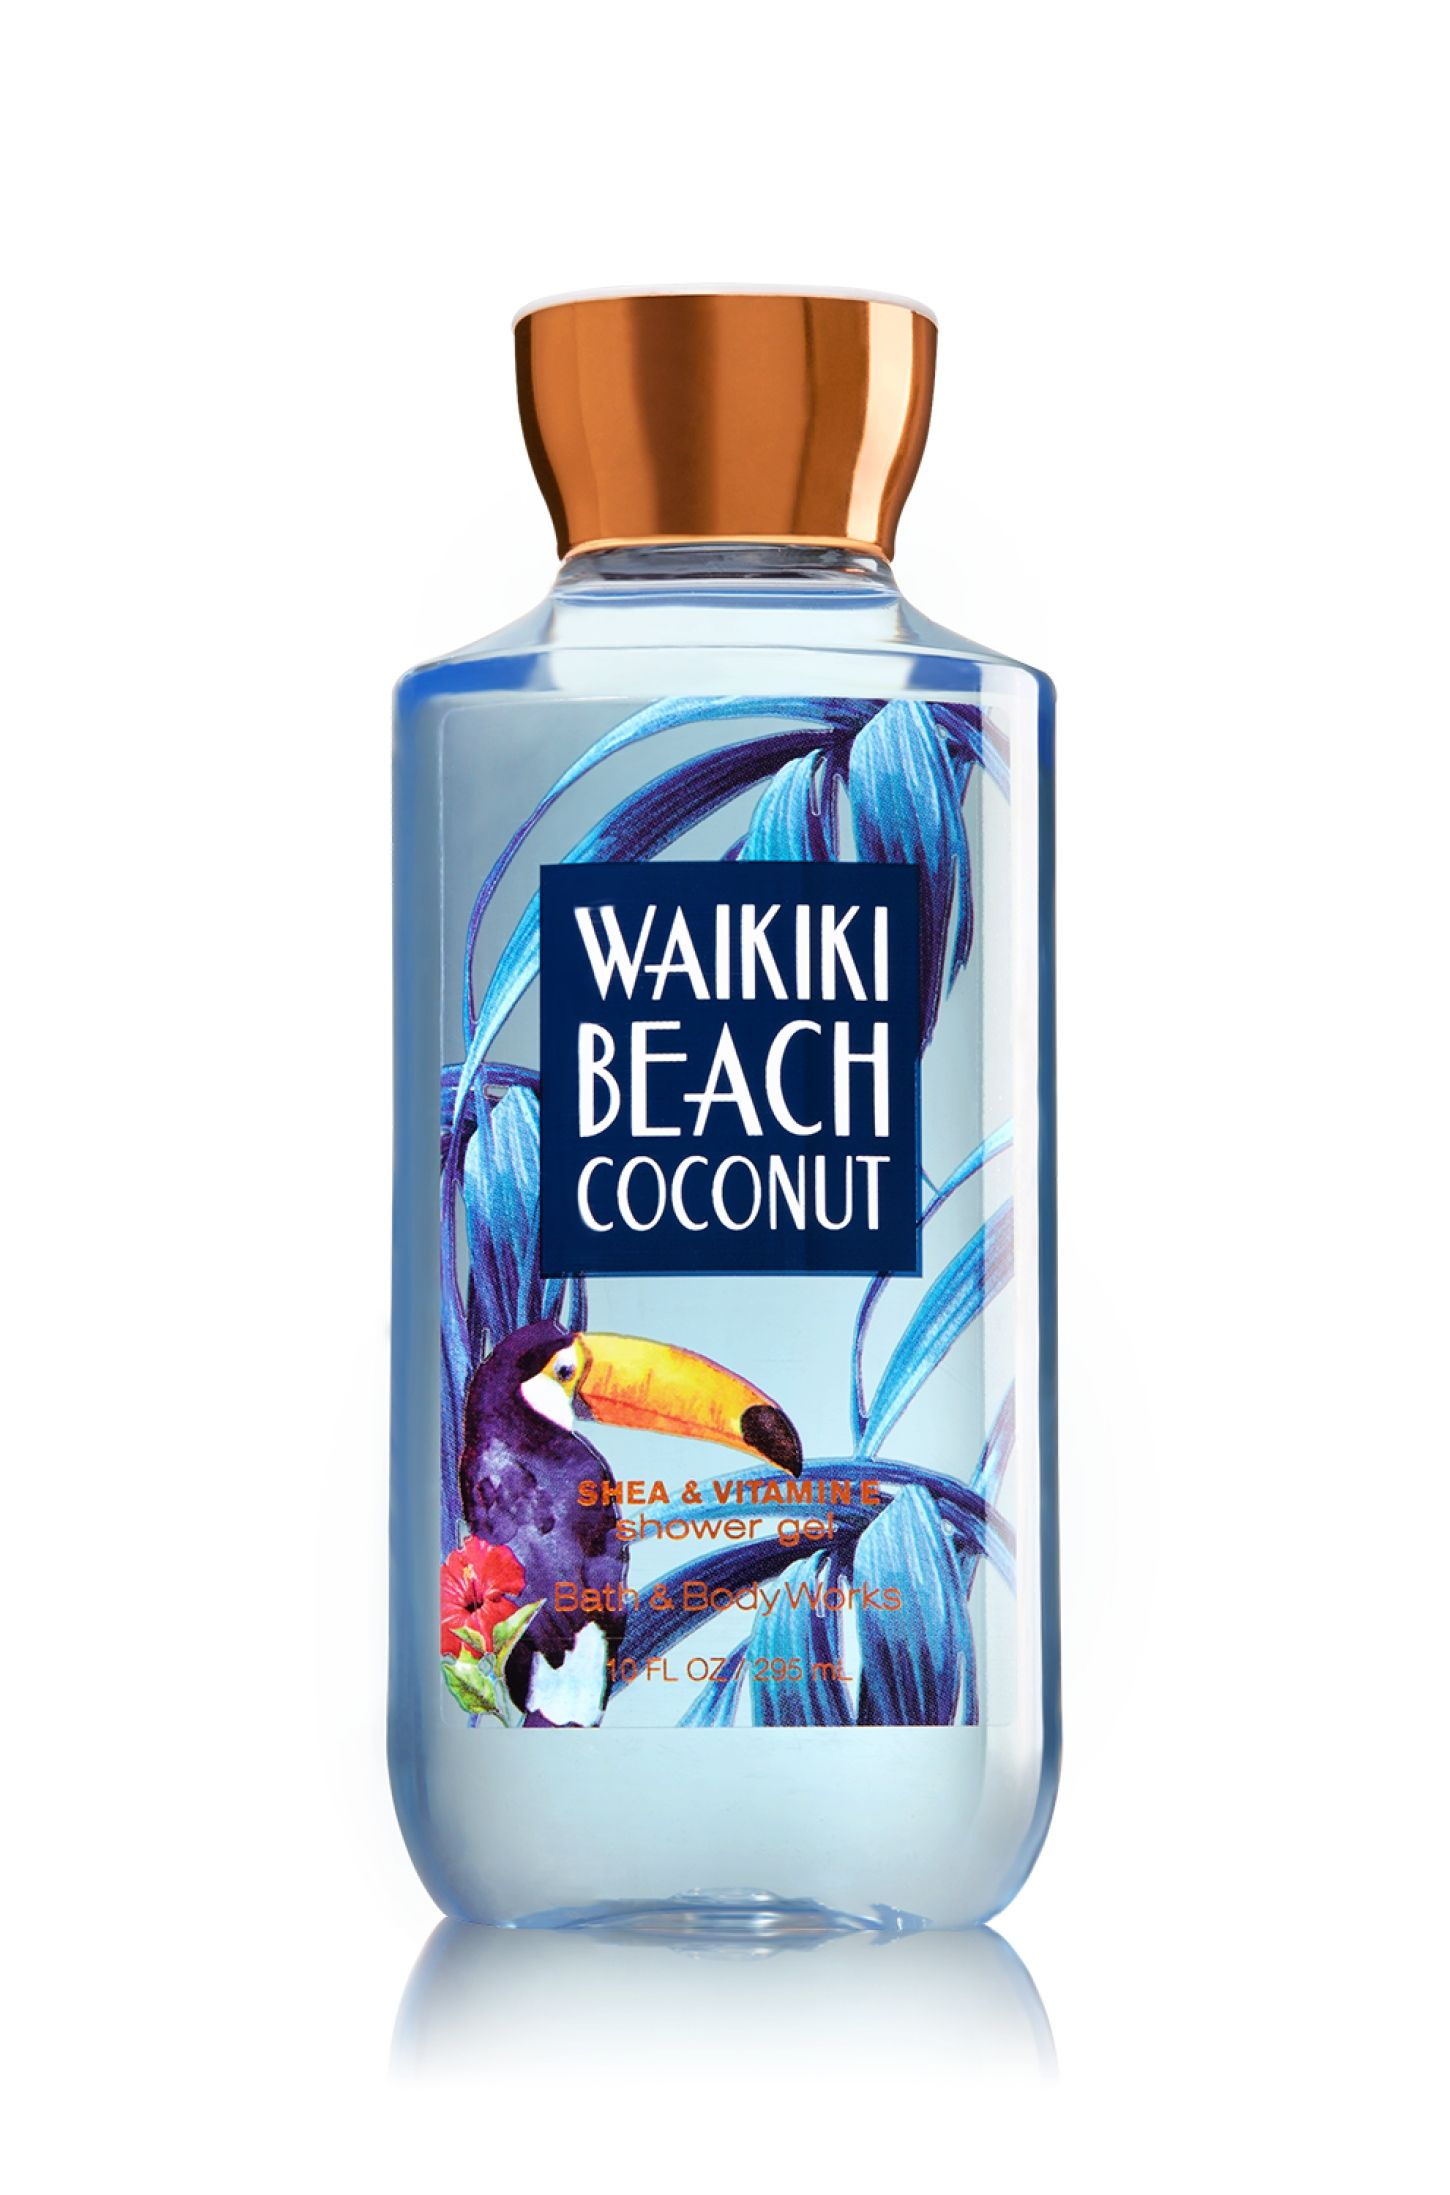 Waikiki Beach Coconut Shower Gel Signature Collection